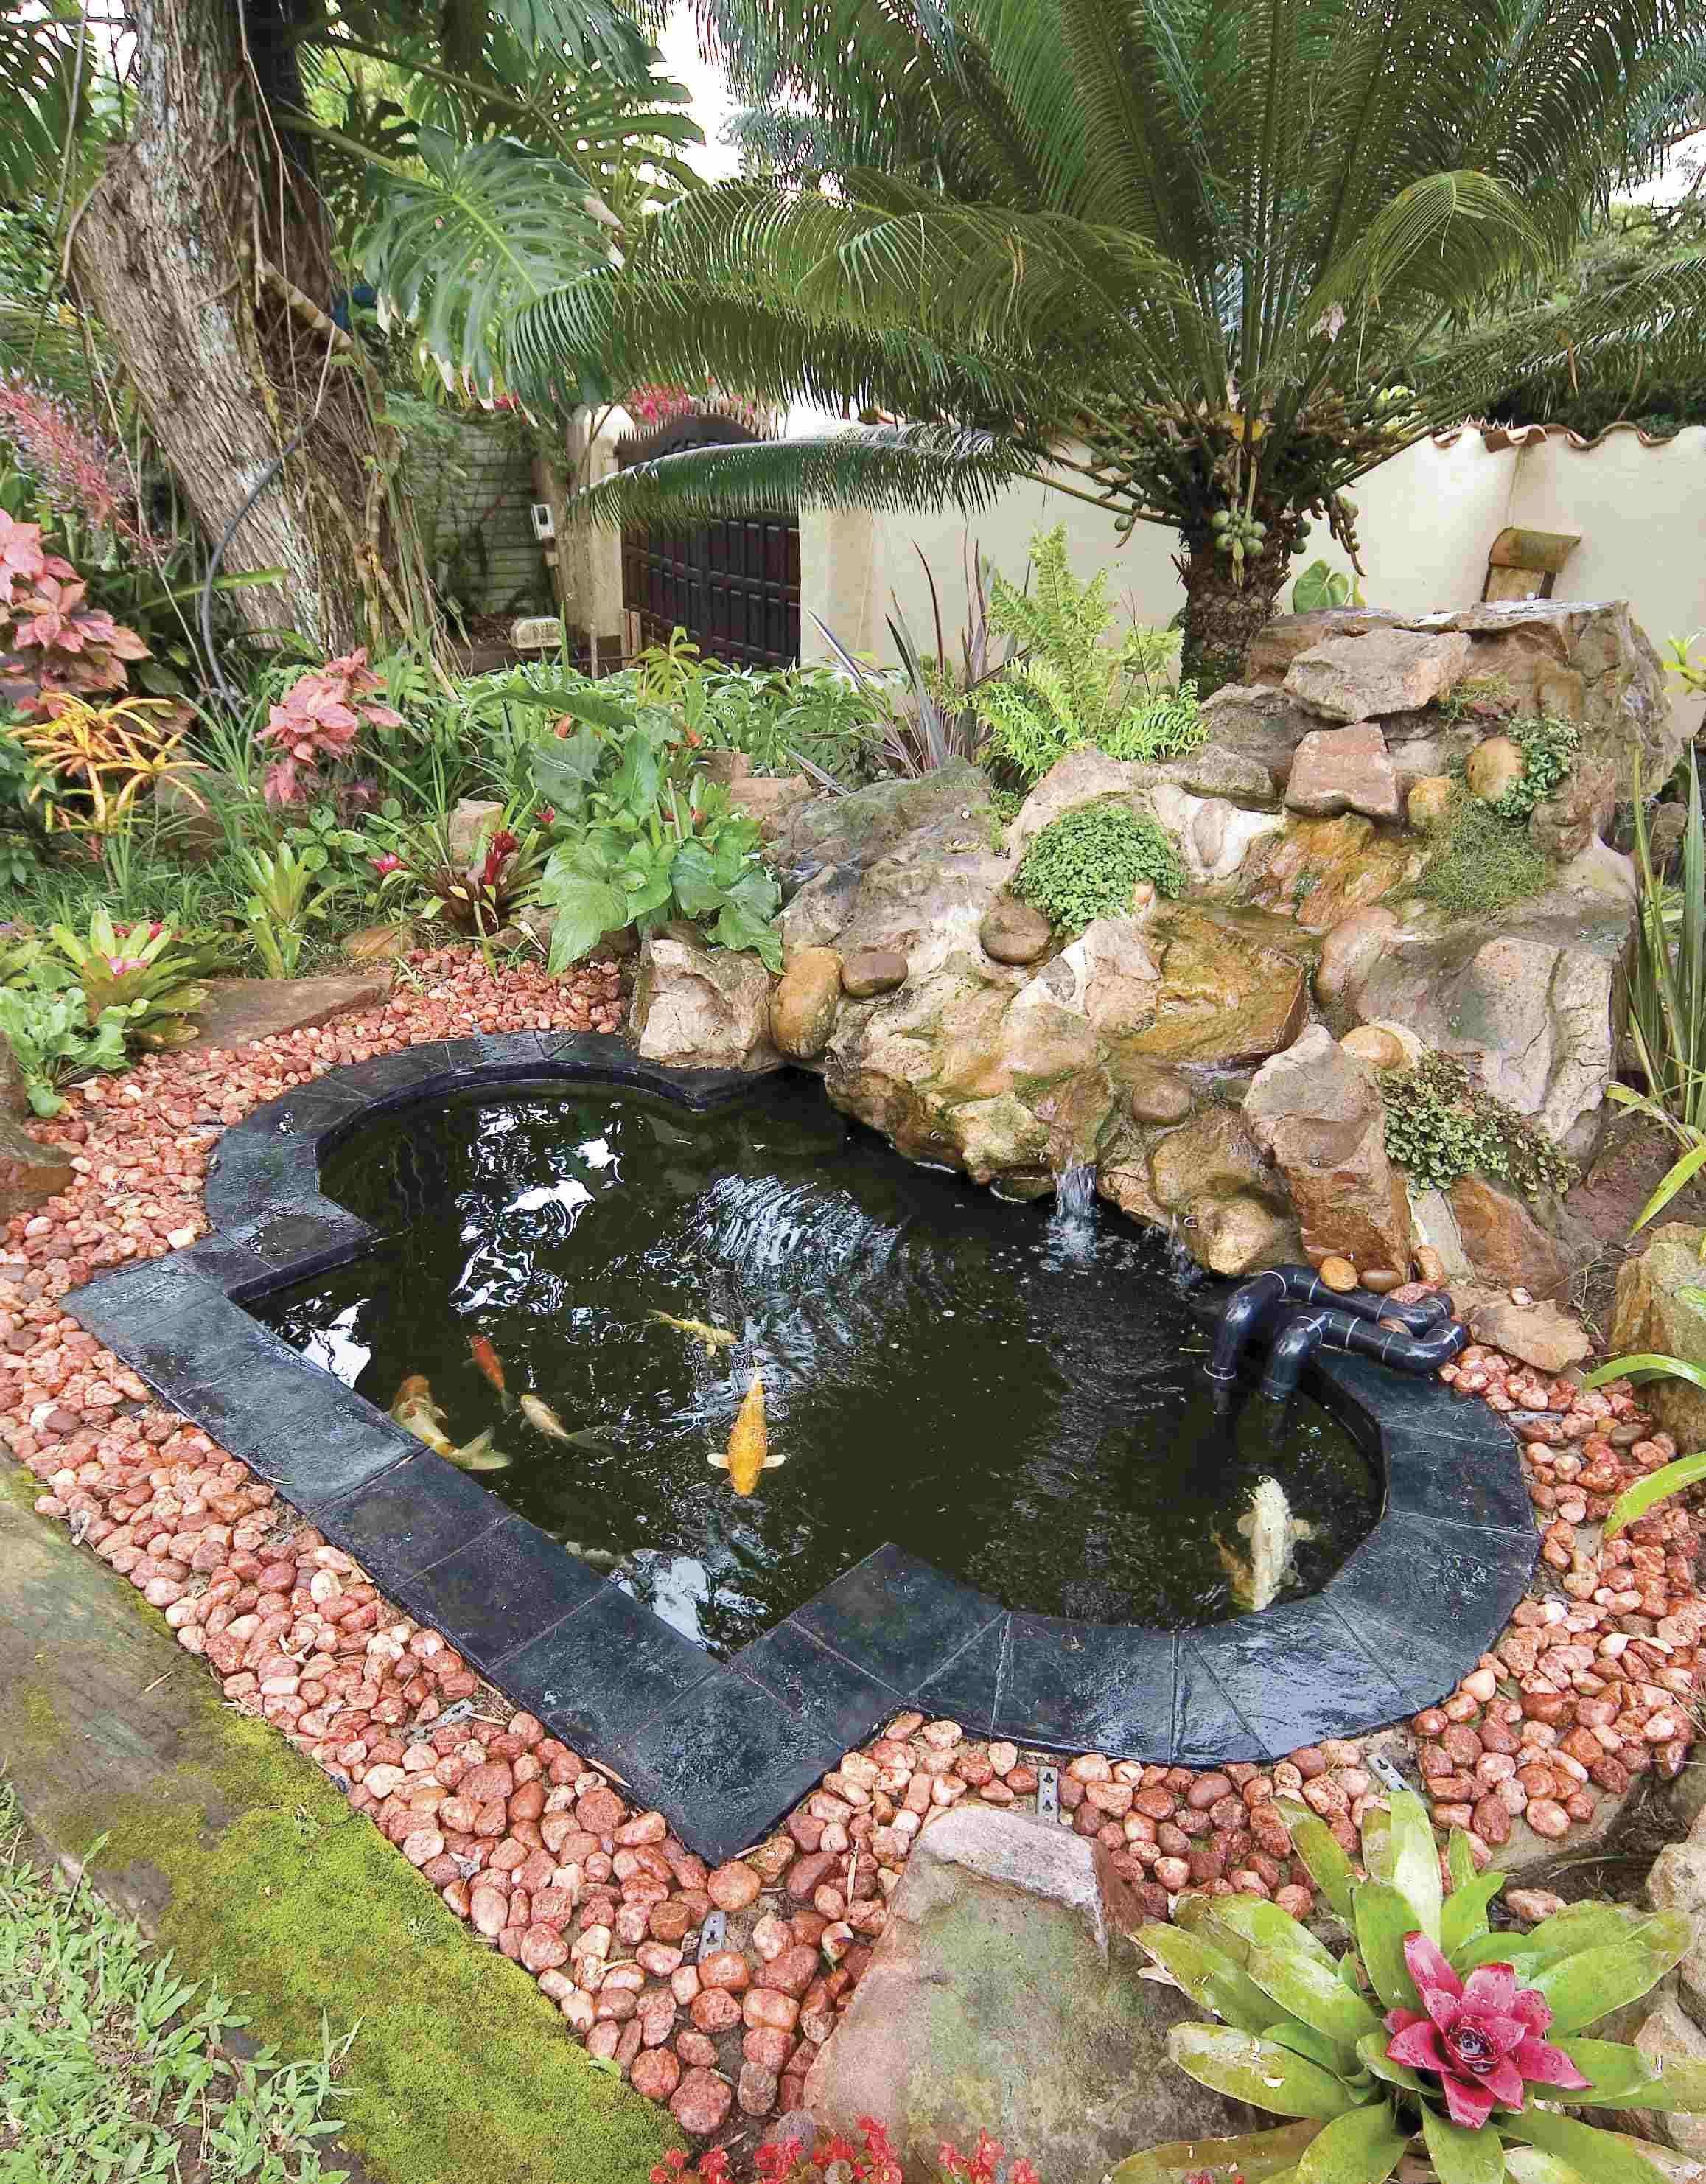 15 Awesome Ways How To Upgrade Backyard Fish Pond Ideas Ponds Backyard Garden Pond Design Fish Pond Gardens